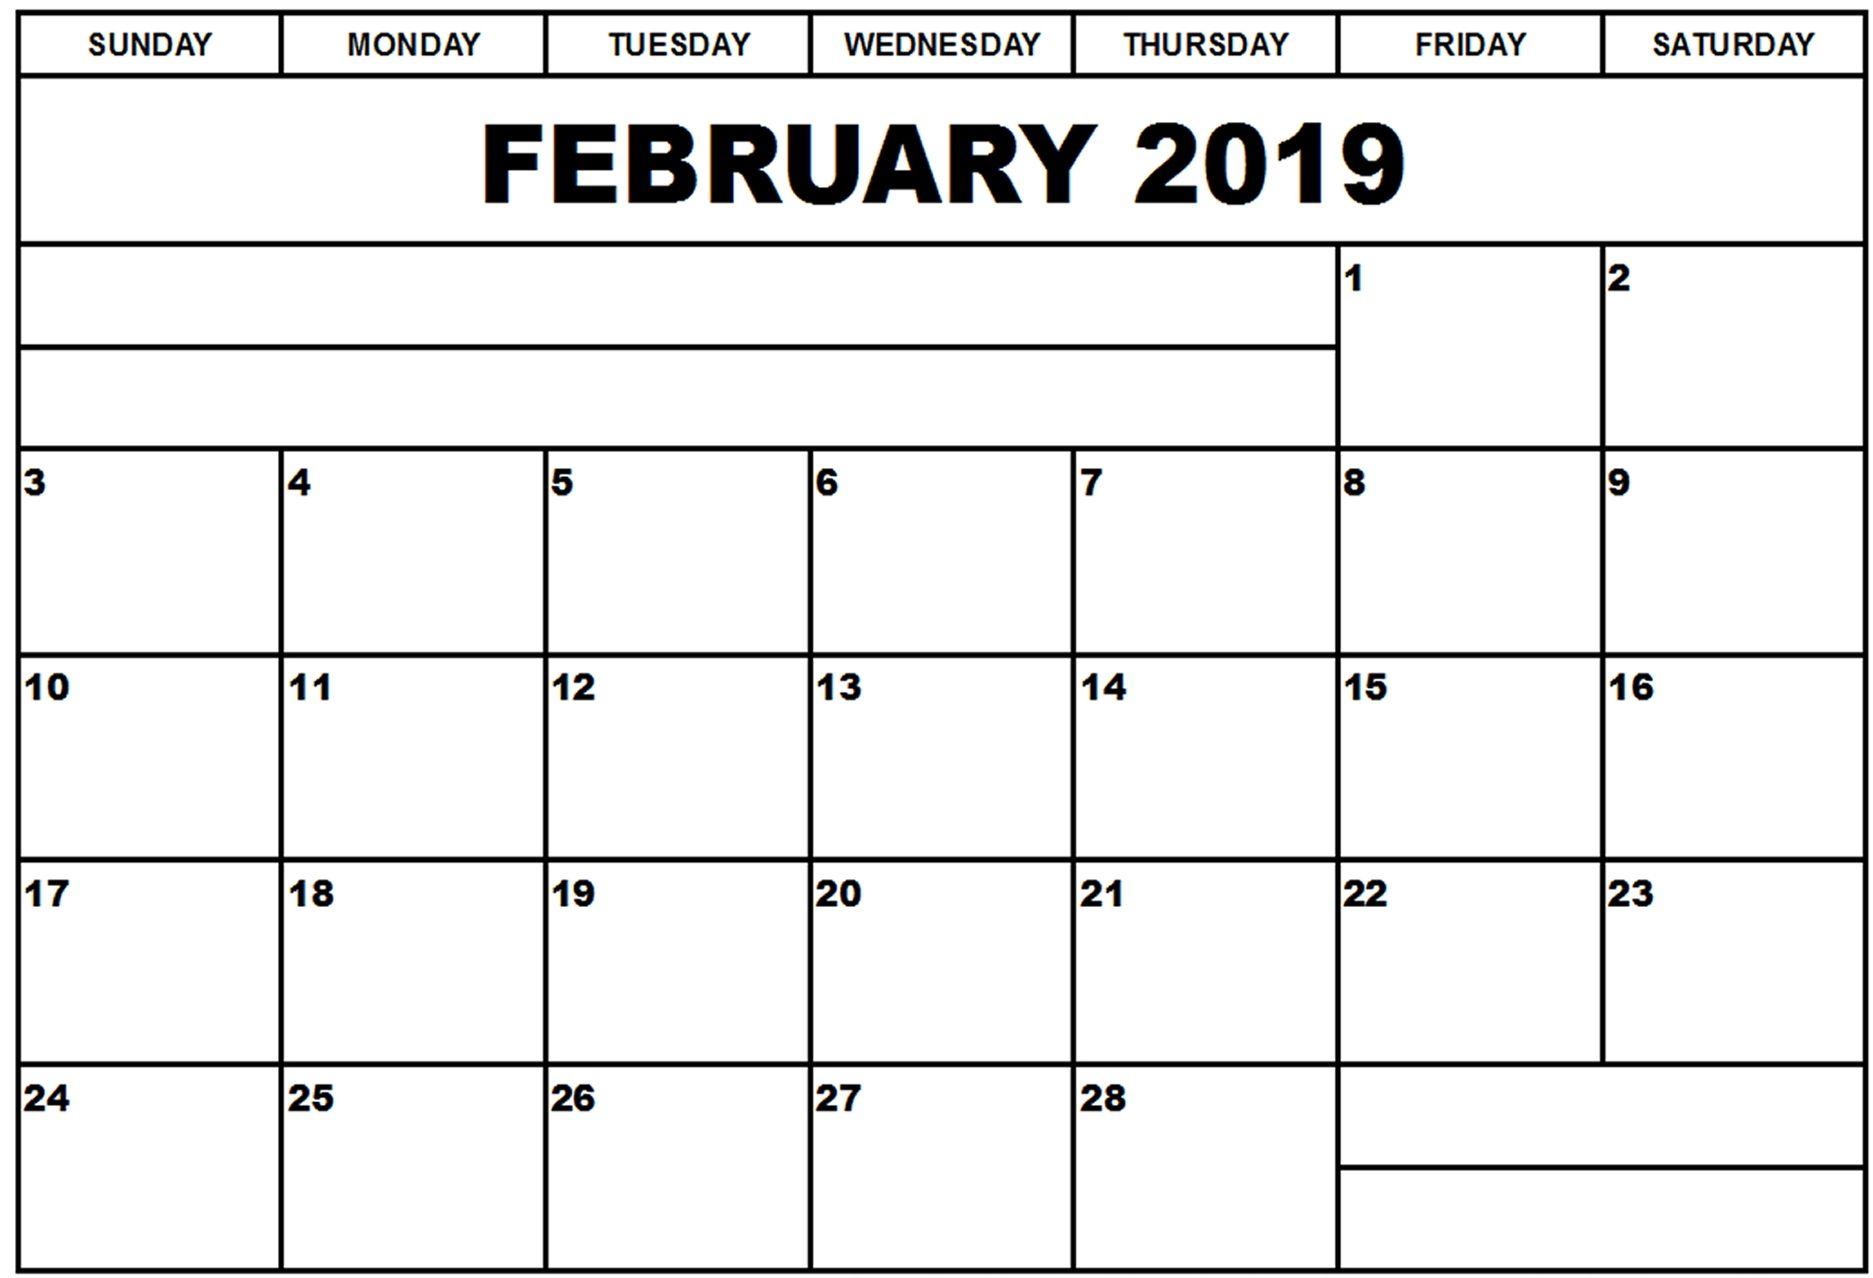 February 2019 Calendar For Word February 2019 Calendar Word #Feb #February #februaryCalendar2019